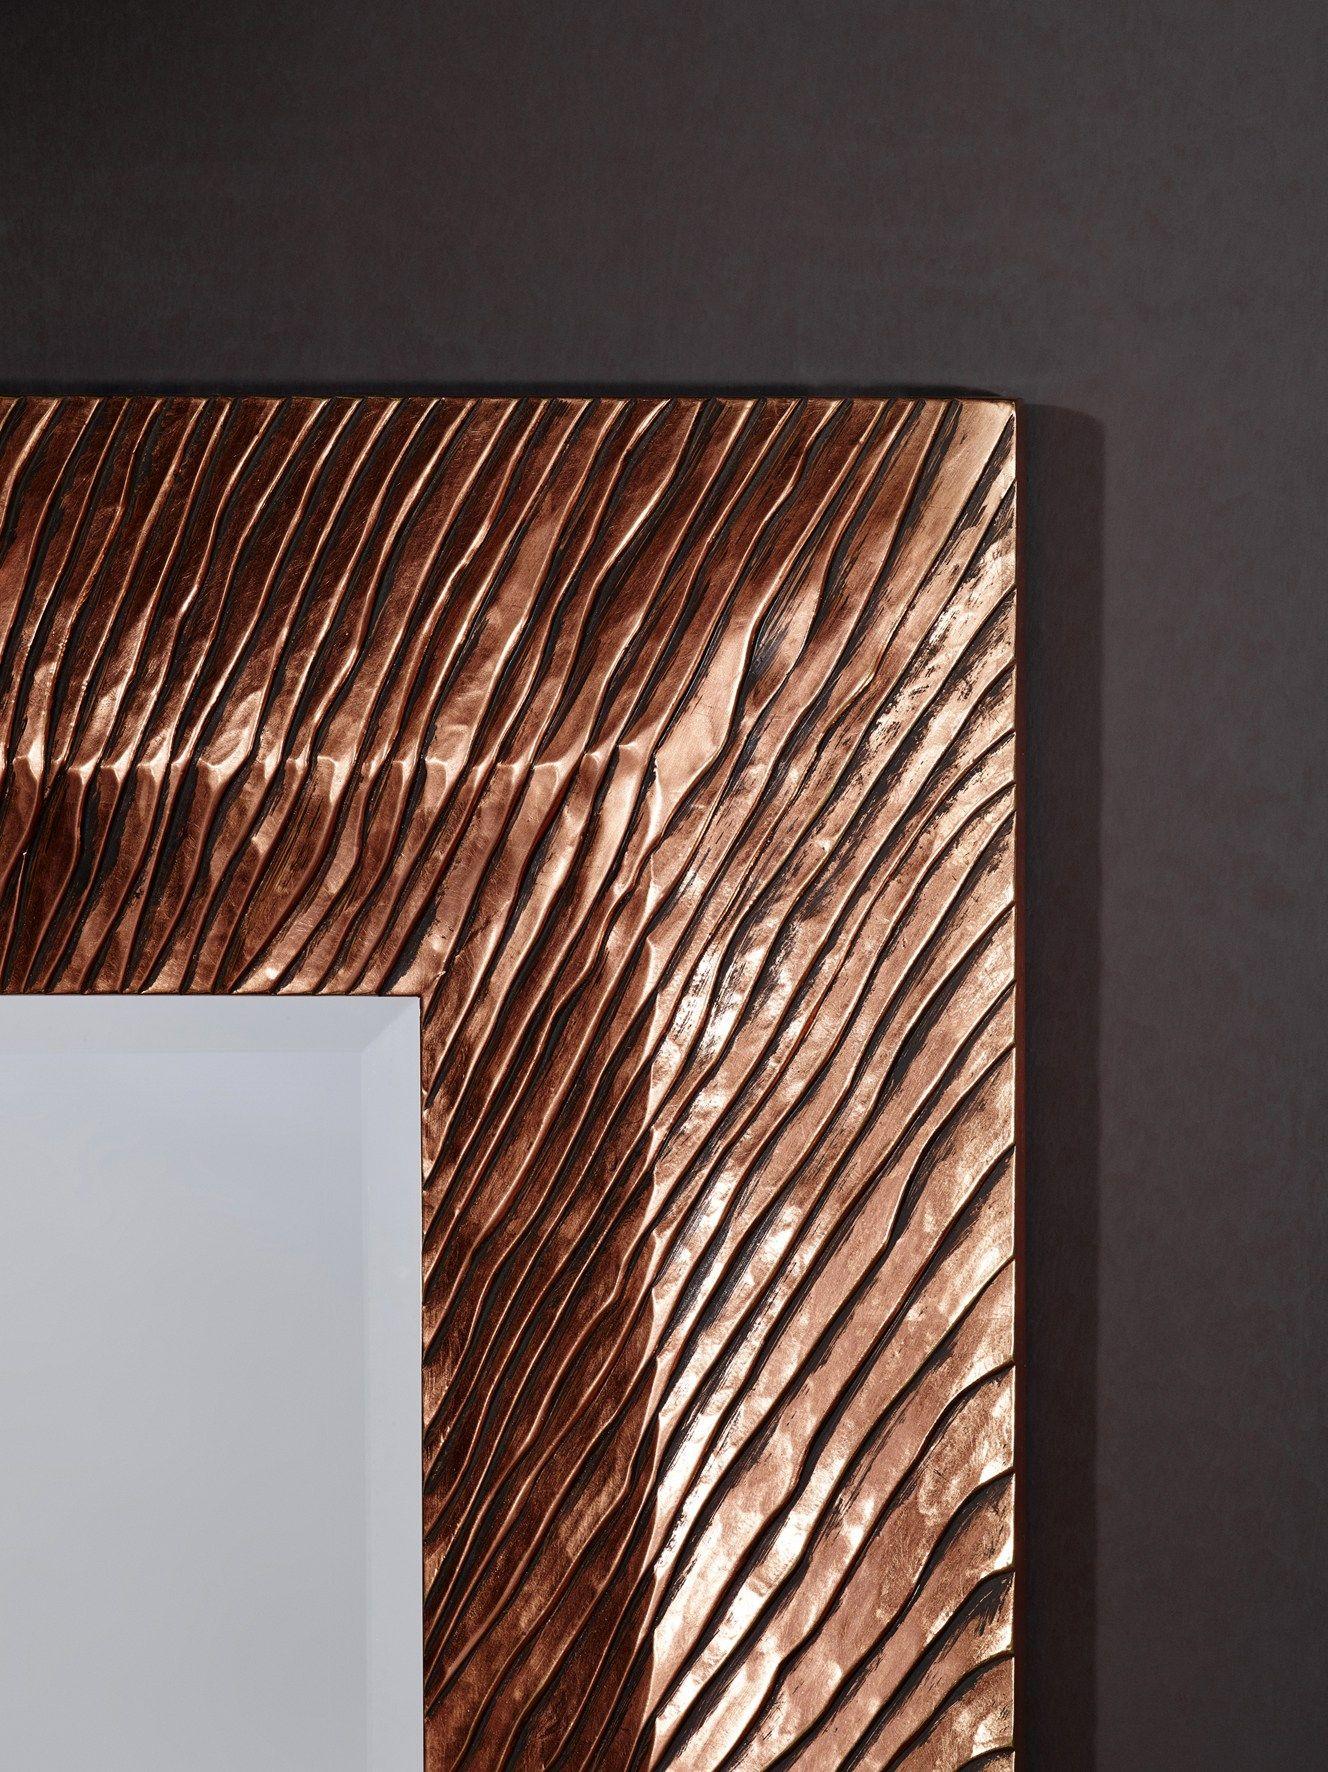 Groove miroir art d co by deknudt mirrors for Miroirs deco